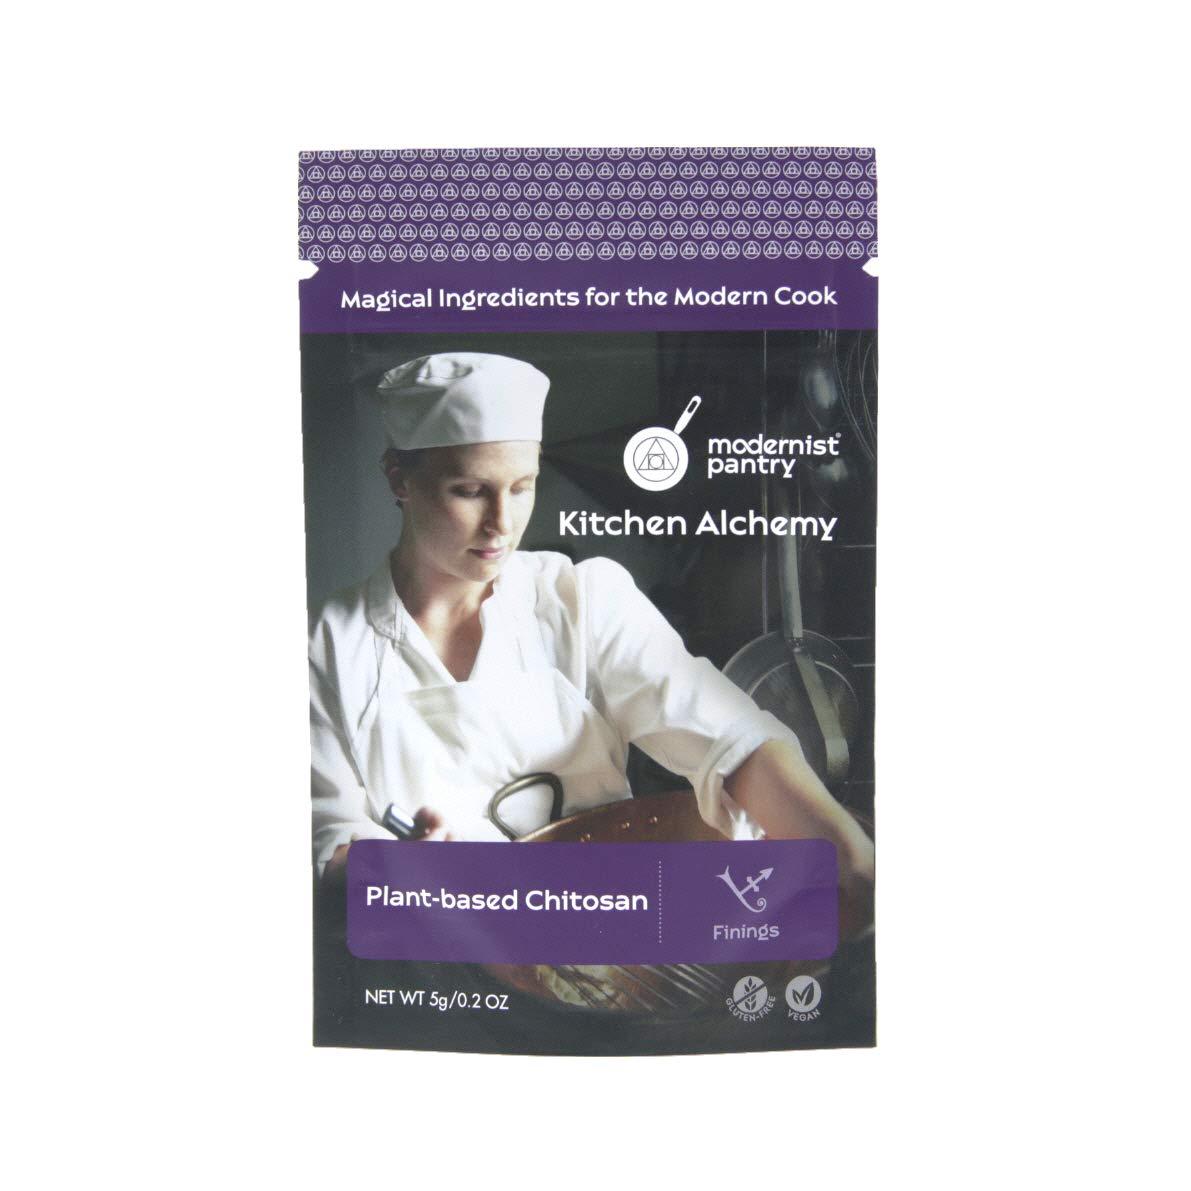 Chitosan (Plant-Based) ❤ Gluten-Free ☮ Vegan - 5g/0.2oz